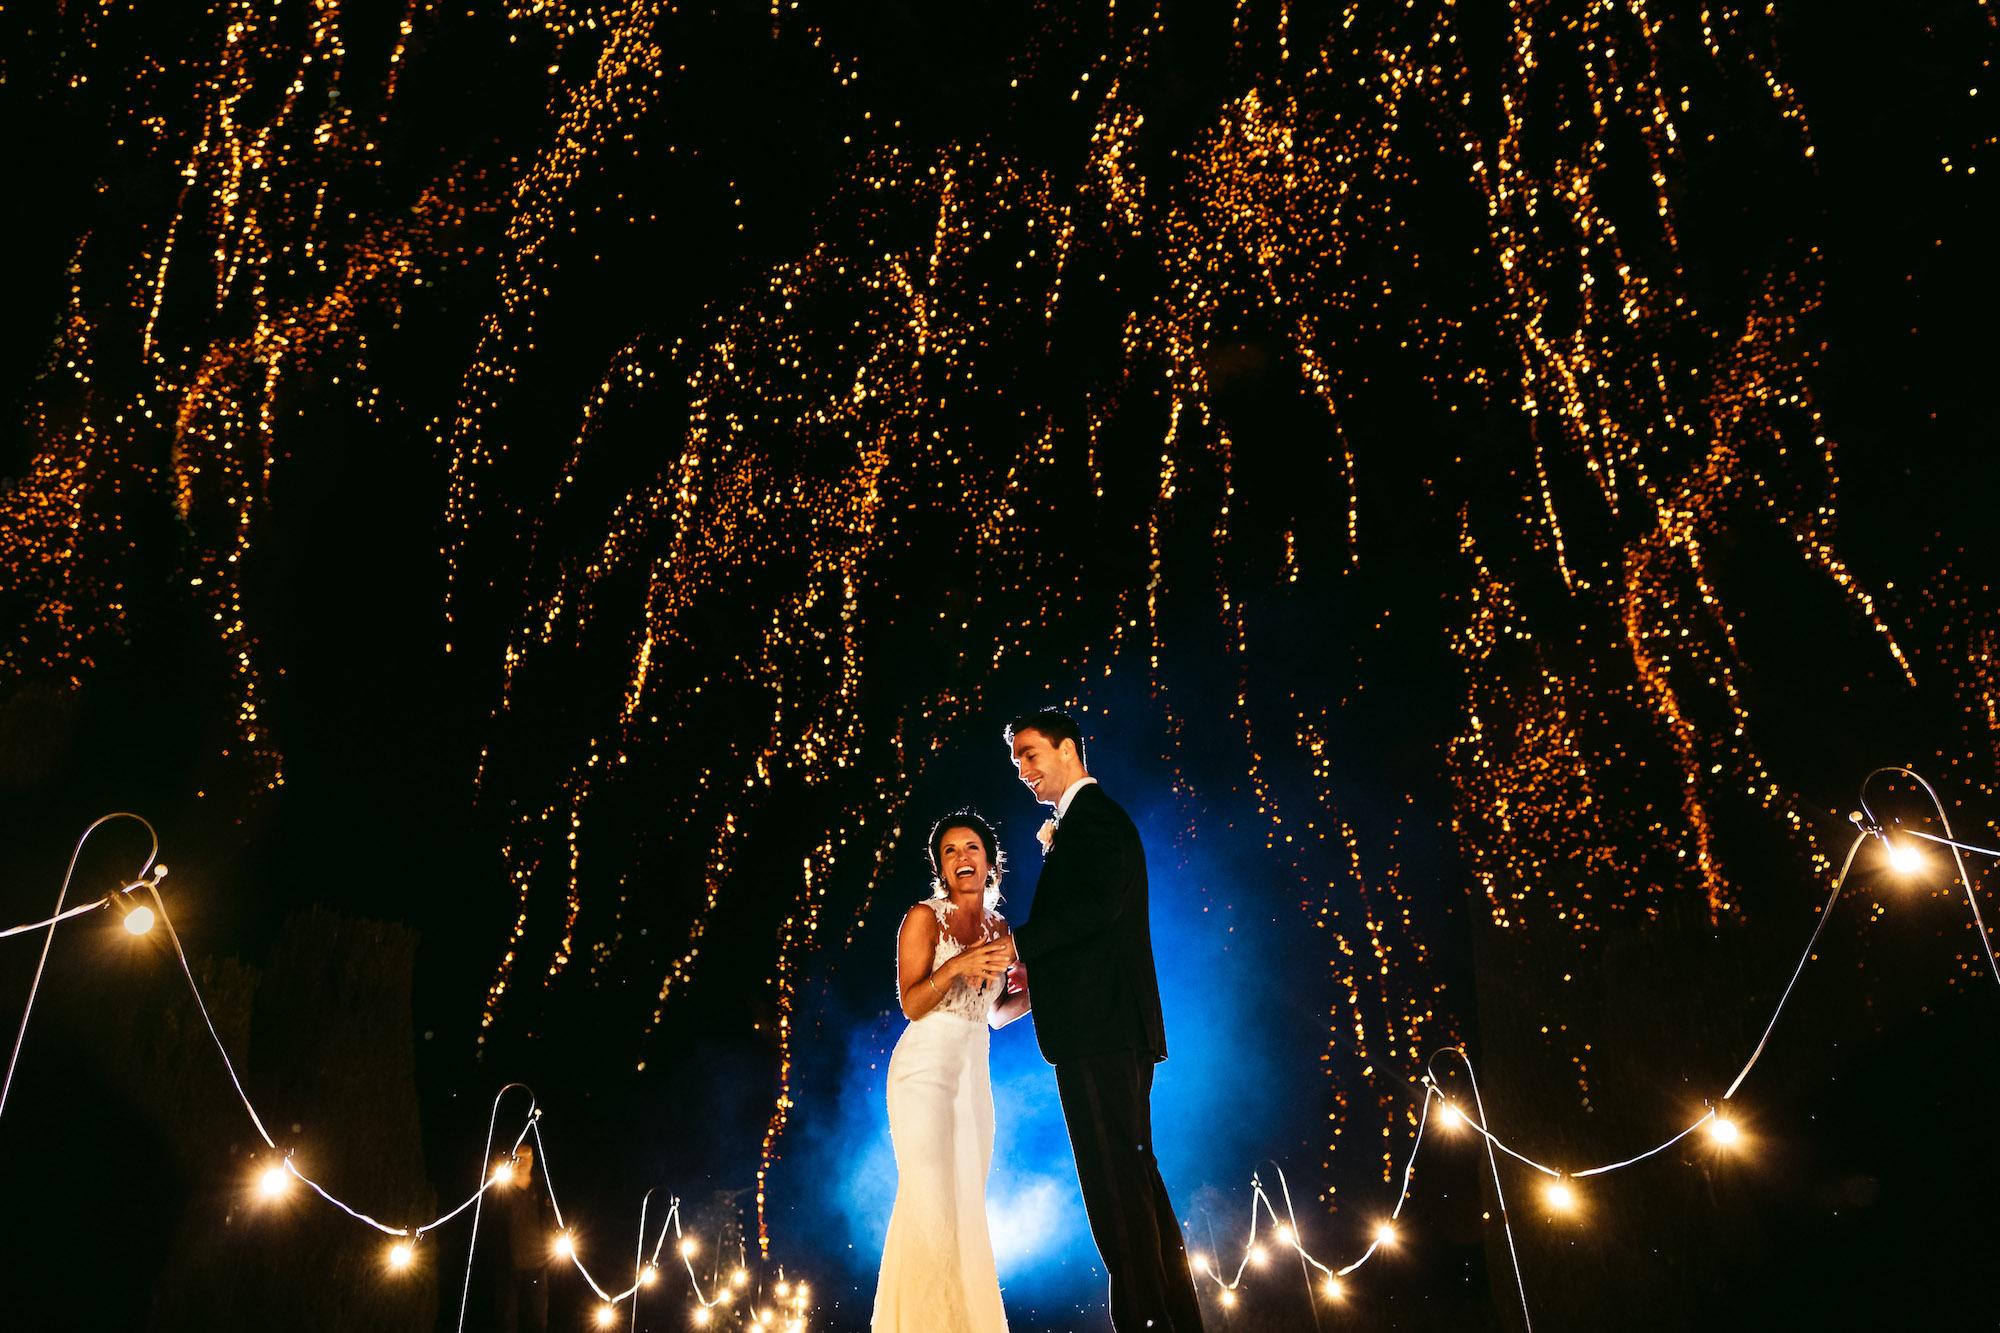 90   Hengrave Hall Wedding   Suffolk Wedding   Lamare London   Luxury Wedding Planner   Jon Mold Photography.jpg